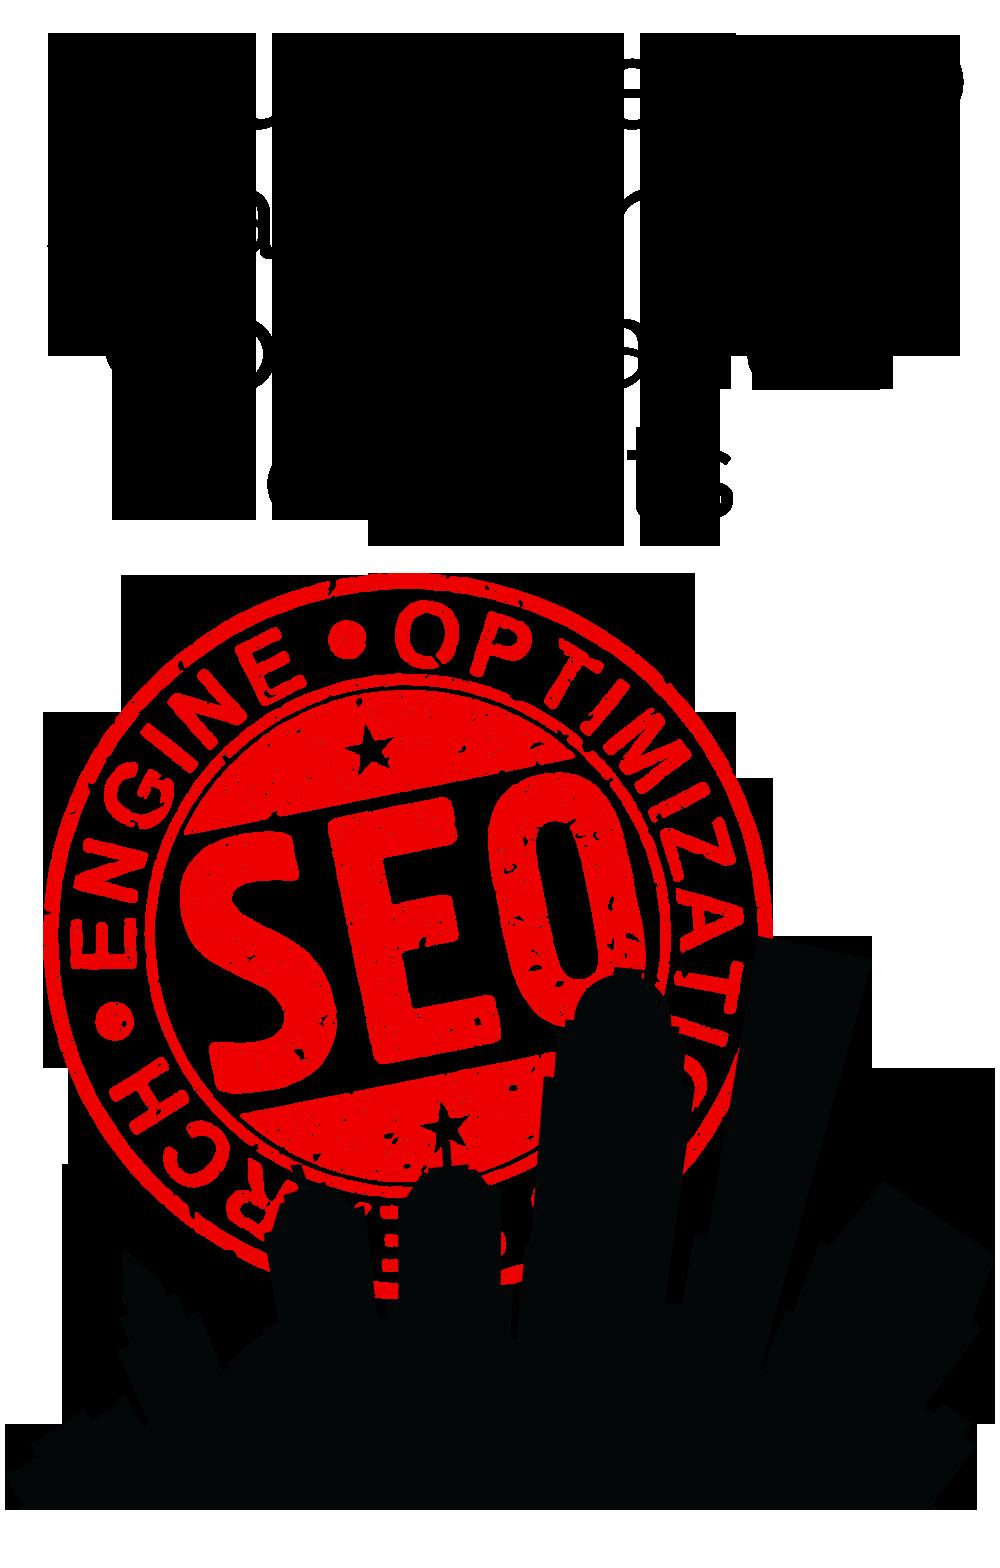 Louisville SEO Search Engine Optimization Experts